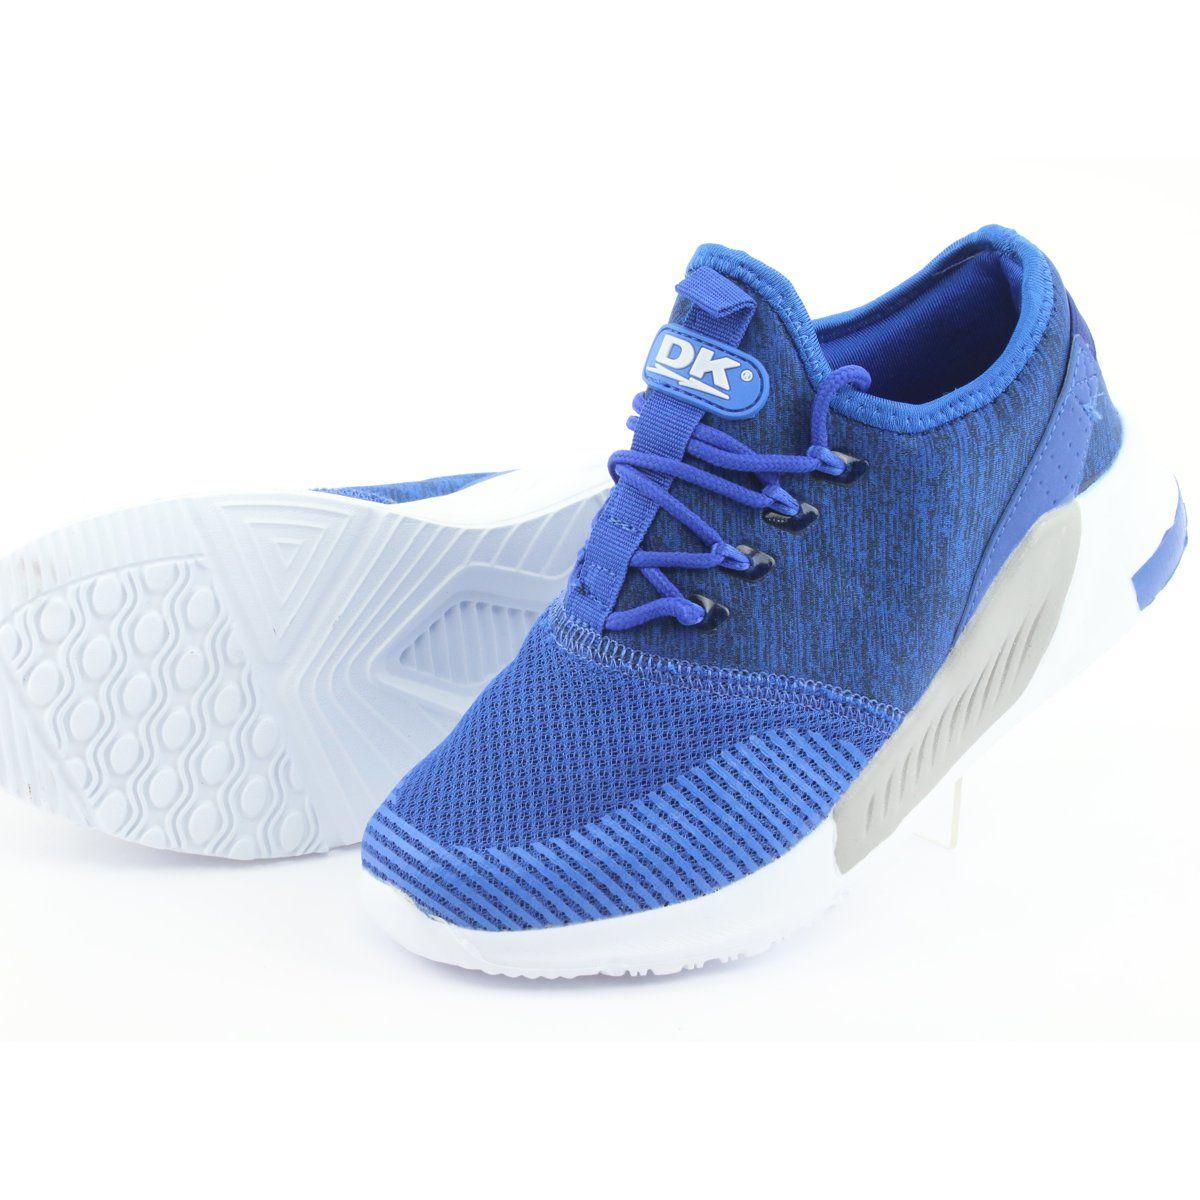 Buty Sportowe Meskie Dk 18470 Royal Blue Niebieskie Sport Shoes Men Sports Shoes Shoes